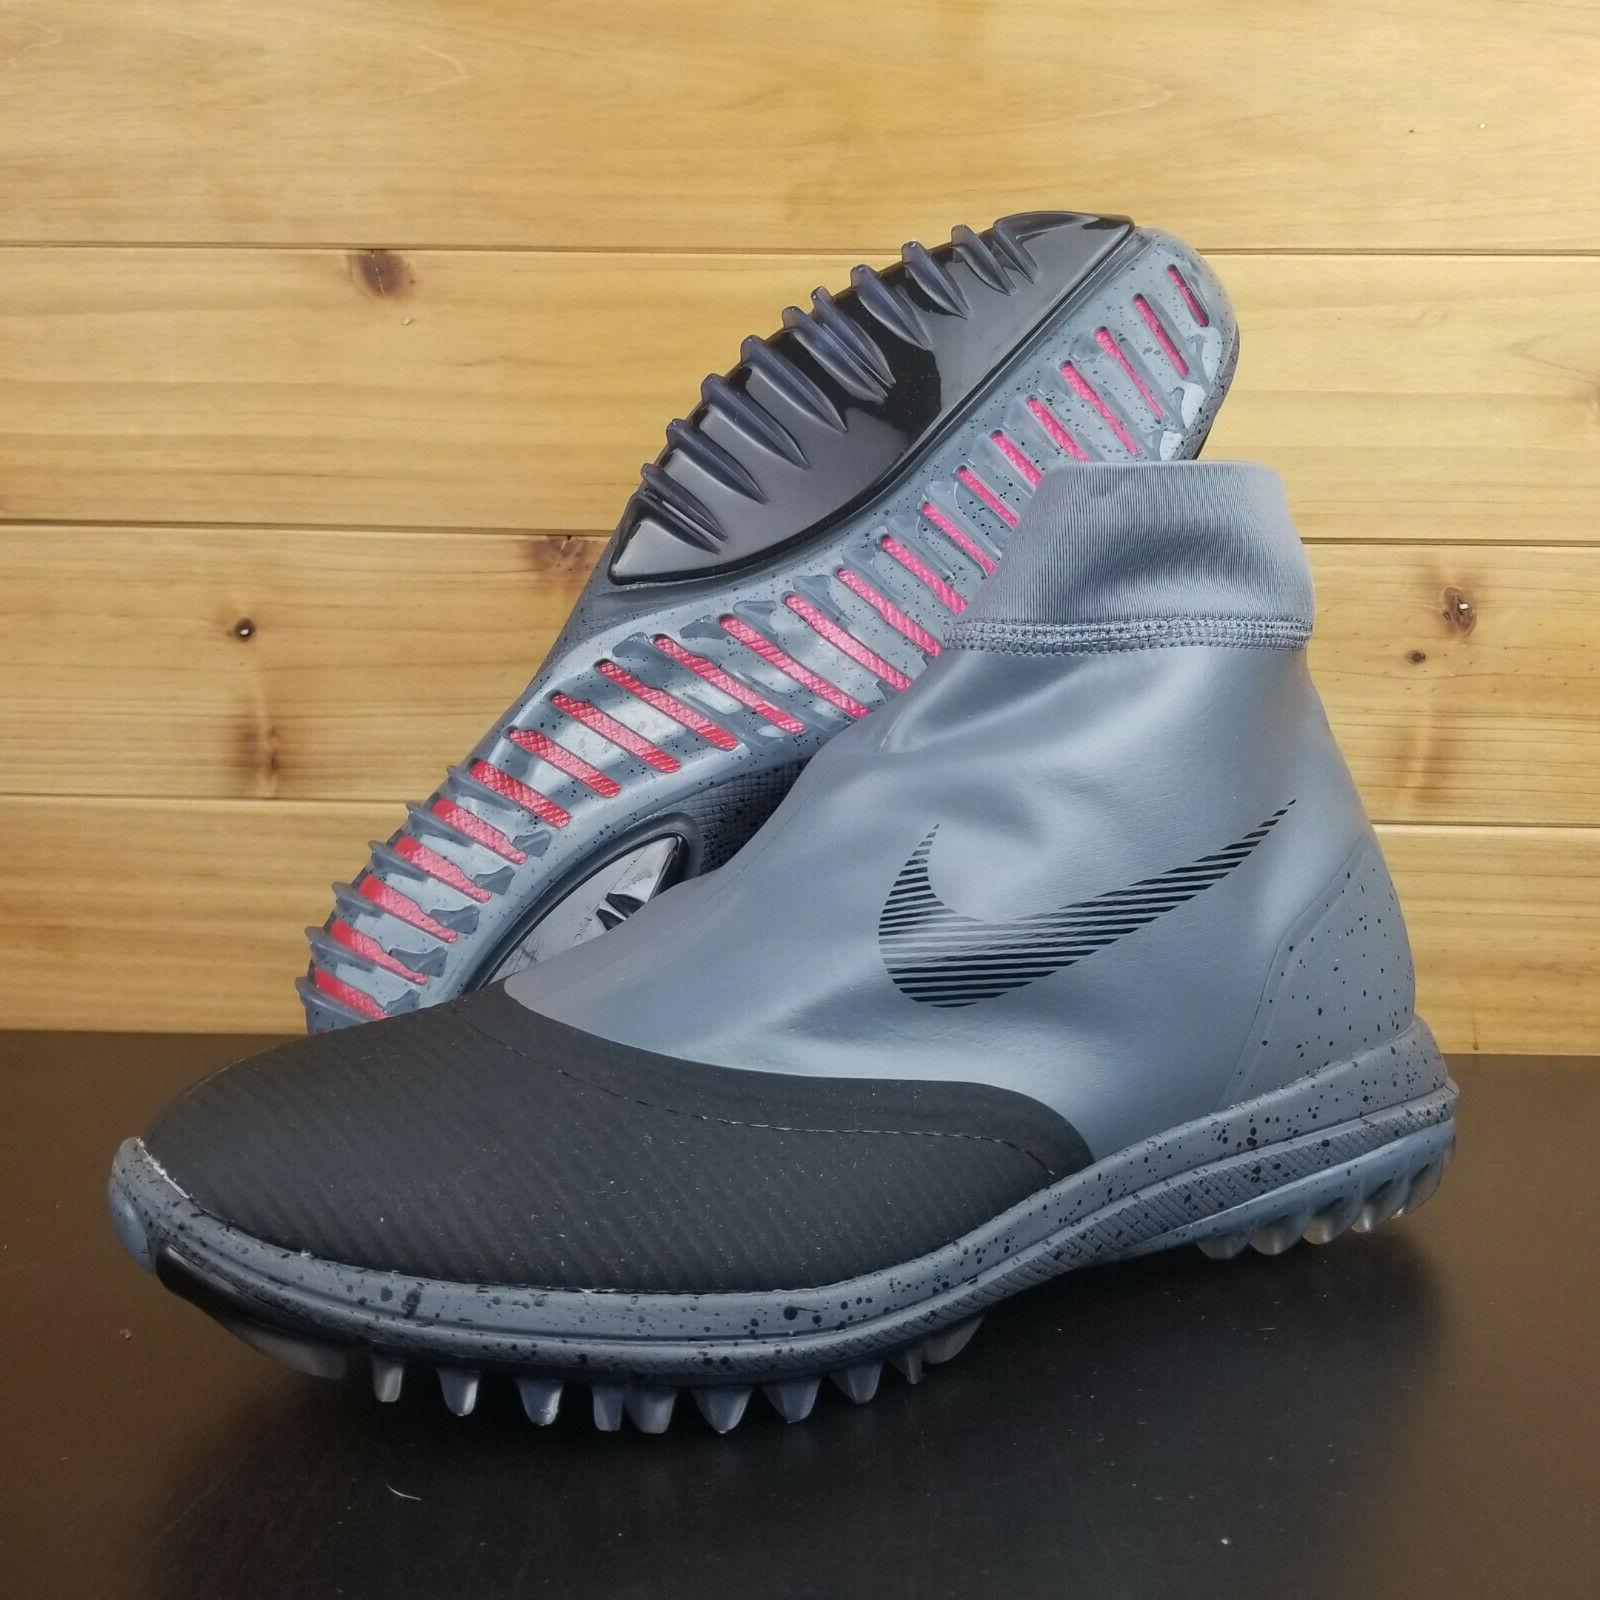 Nike Lunar Shoes Gray Black Men's